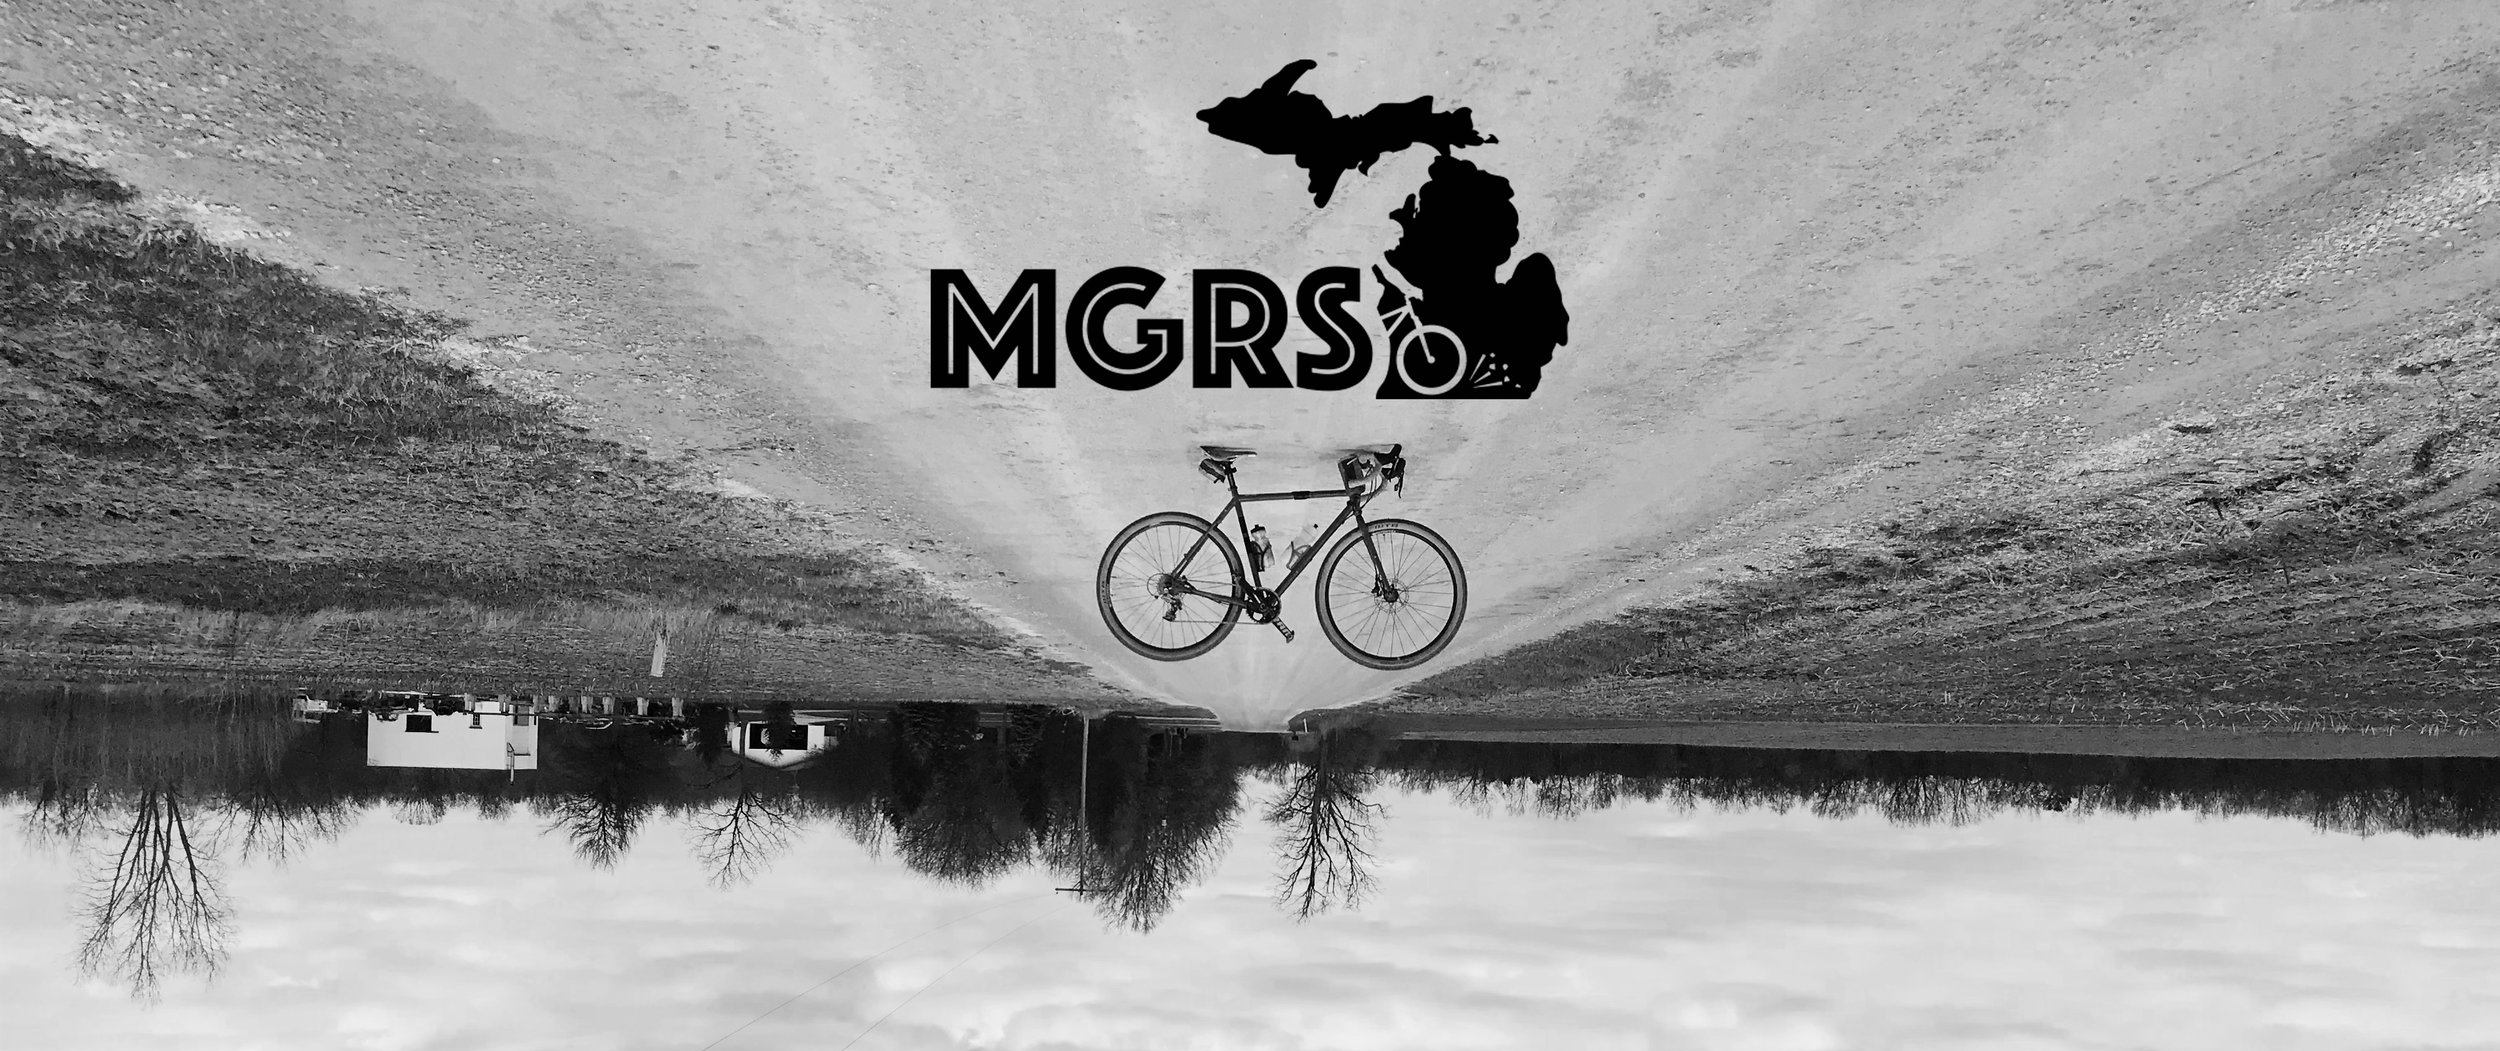 MGRS-cover-photo.jpg